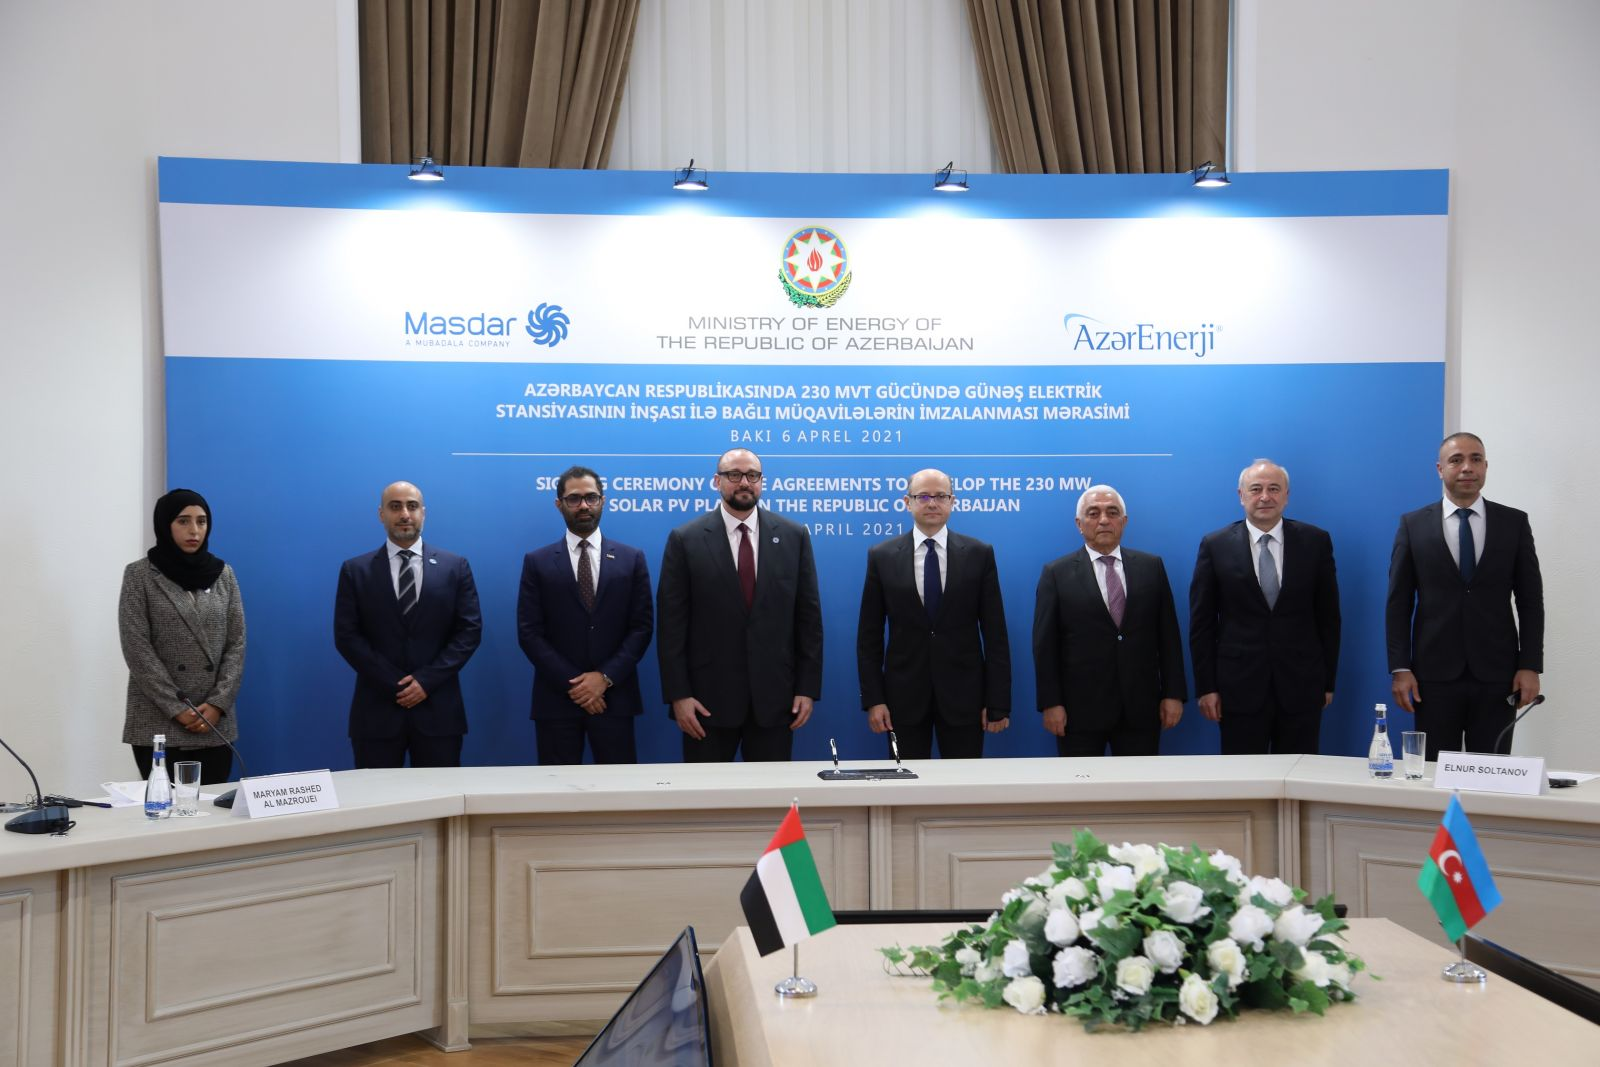 Azerbaijan signs agreement on solar power plant (230 MW) project with Masdar